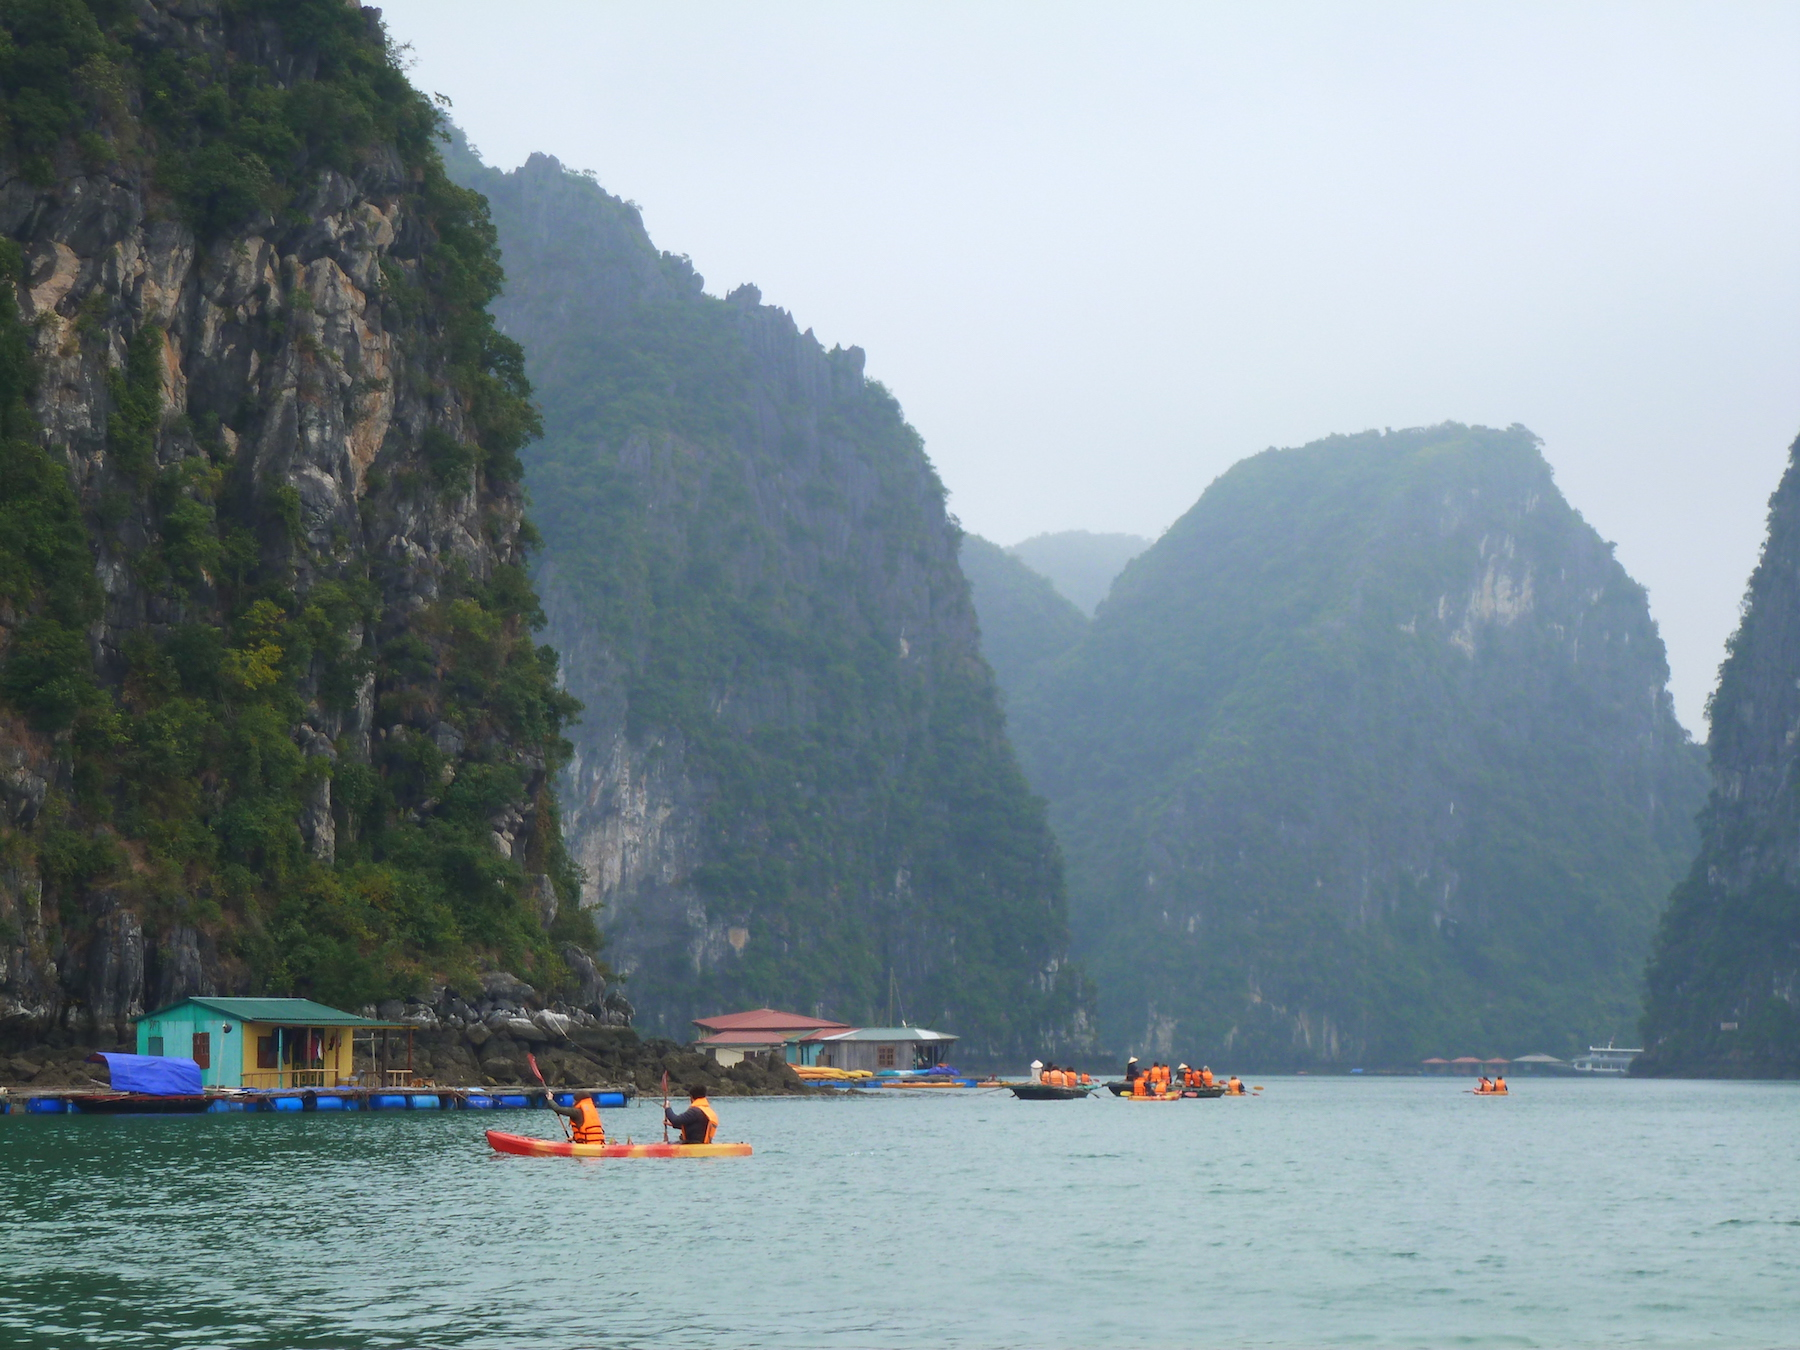 KayakingHalongBay copy